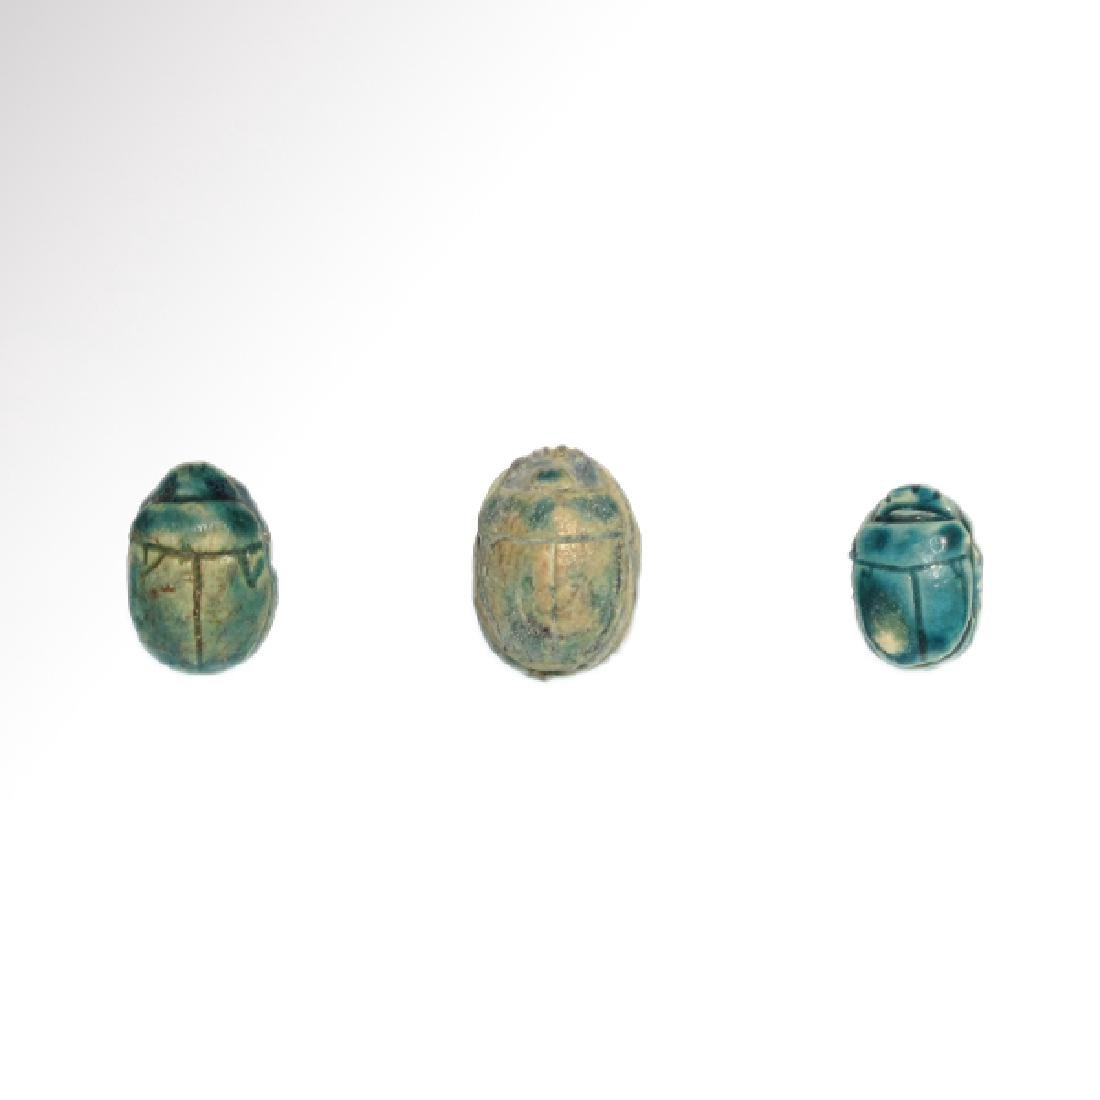 Three Egyptian Glazed Steatite Scarabs, c. 1500 B.C.